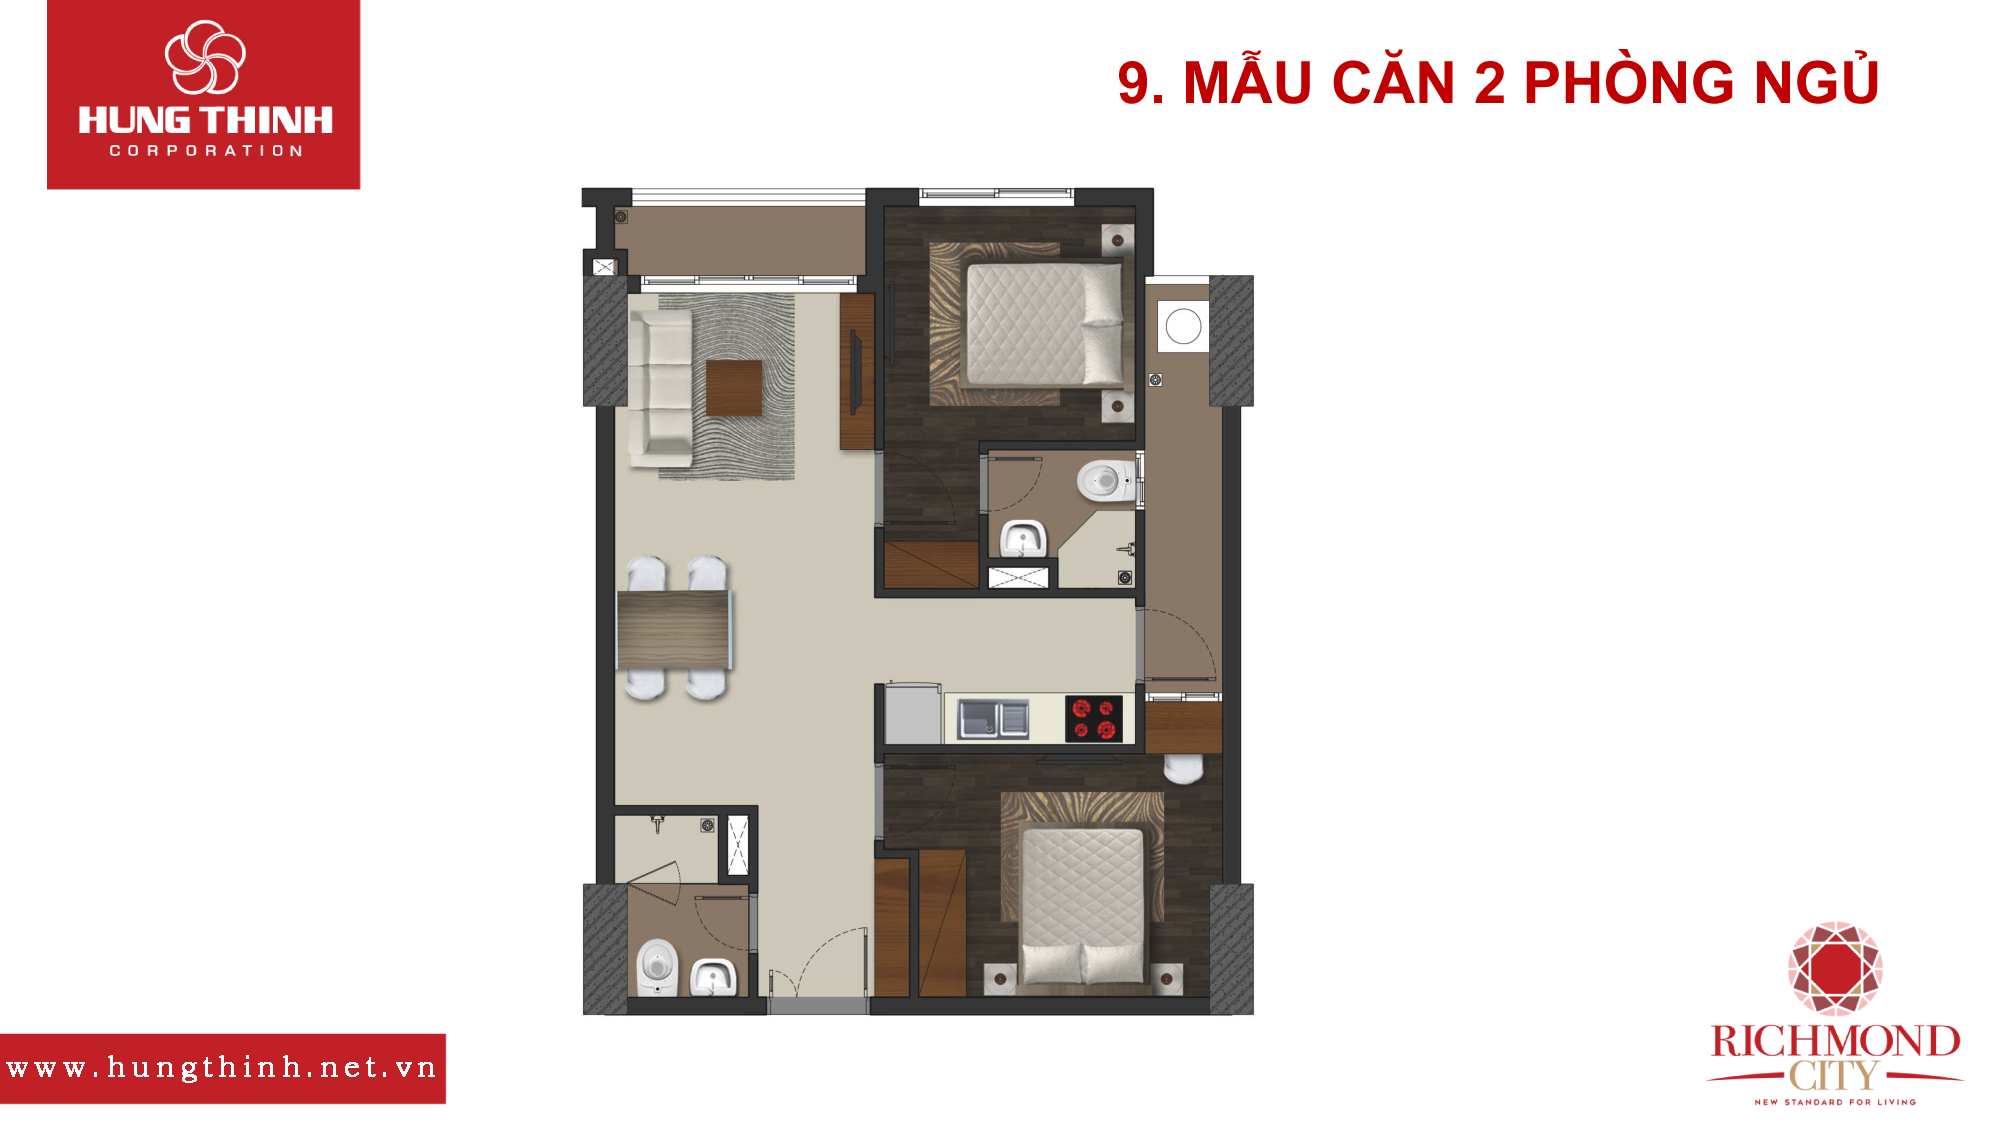 Mẫu căn hộ 2 PN Richmond City